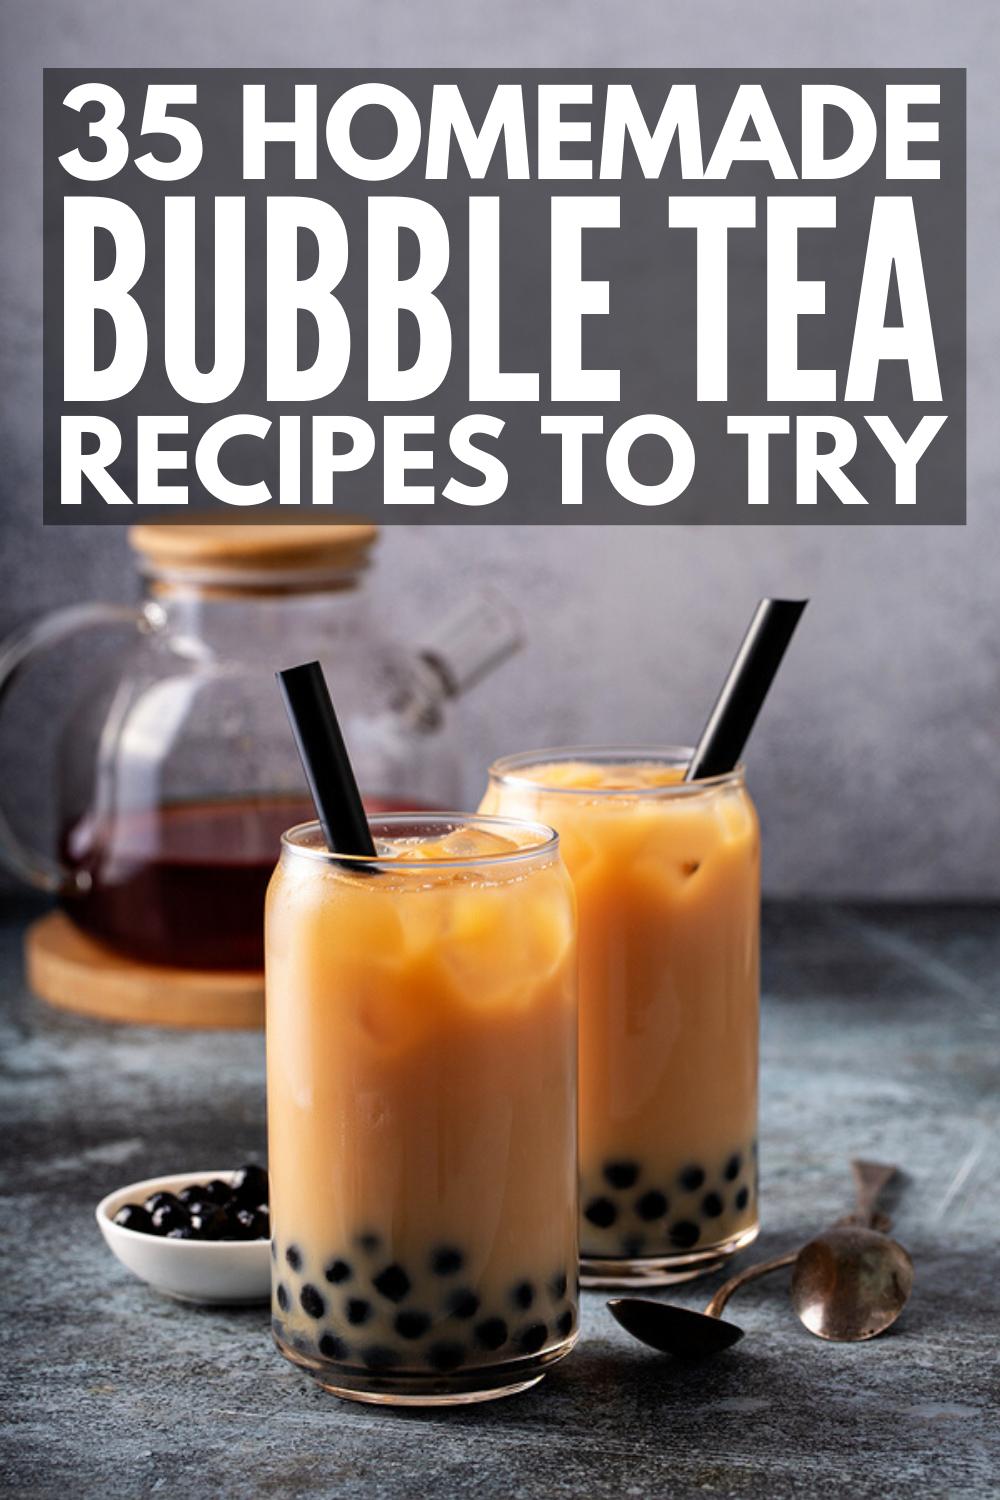 How To Make Bubble Tea At Home 35 Bubble Tea Recipes We Love Bubble Tea Recipe Fruit Tea Recipes Boba Tea Recipe